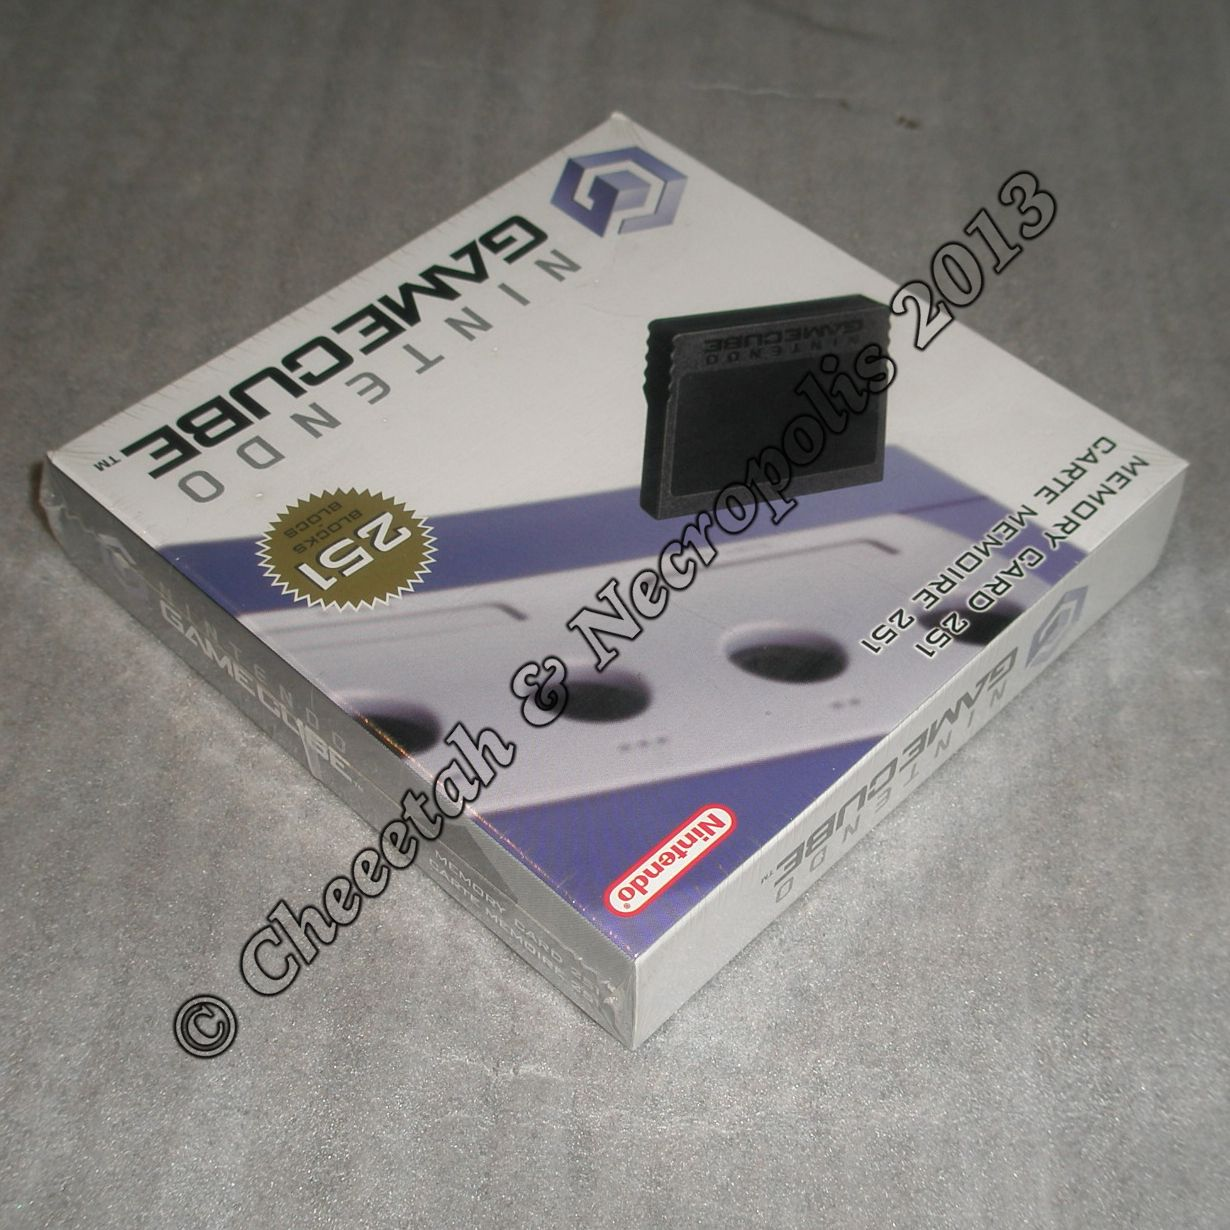 http://arcadius.esero.net/Console/Nintendo/Game_Cube/Memory_Card_251_Blocks_03.jpg